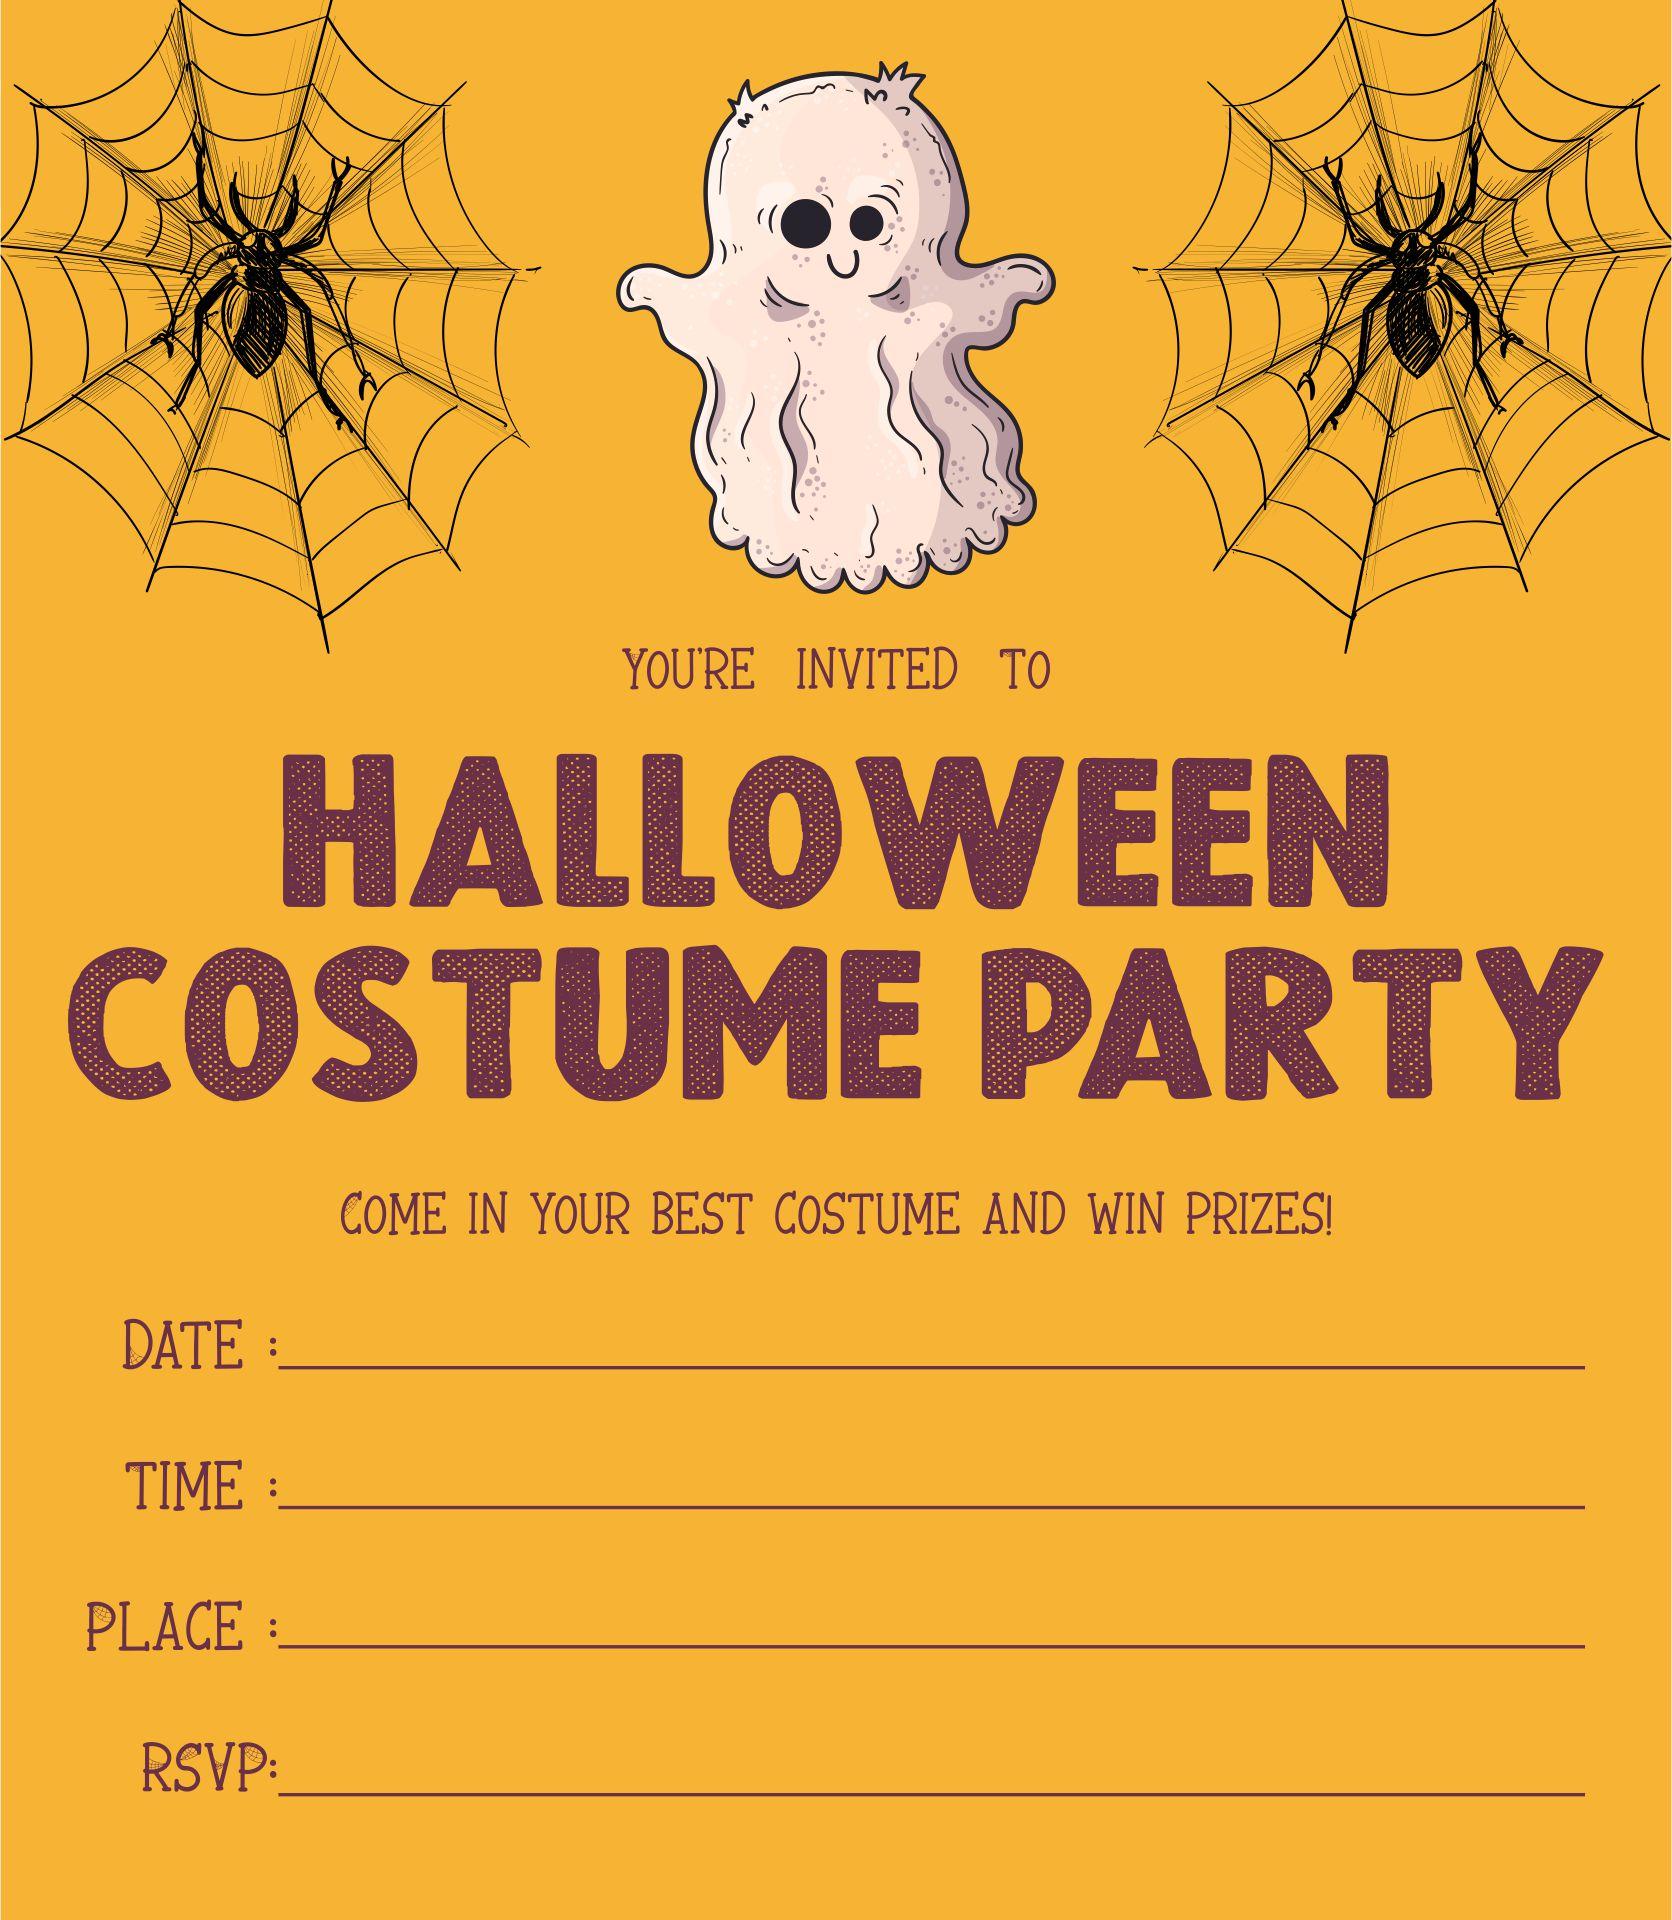 Creepy Halloween Scare Costume Party Invitation